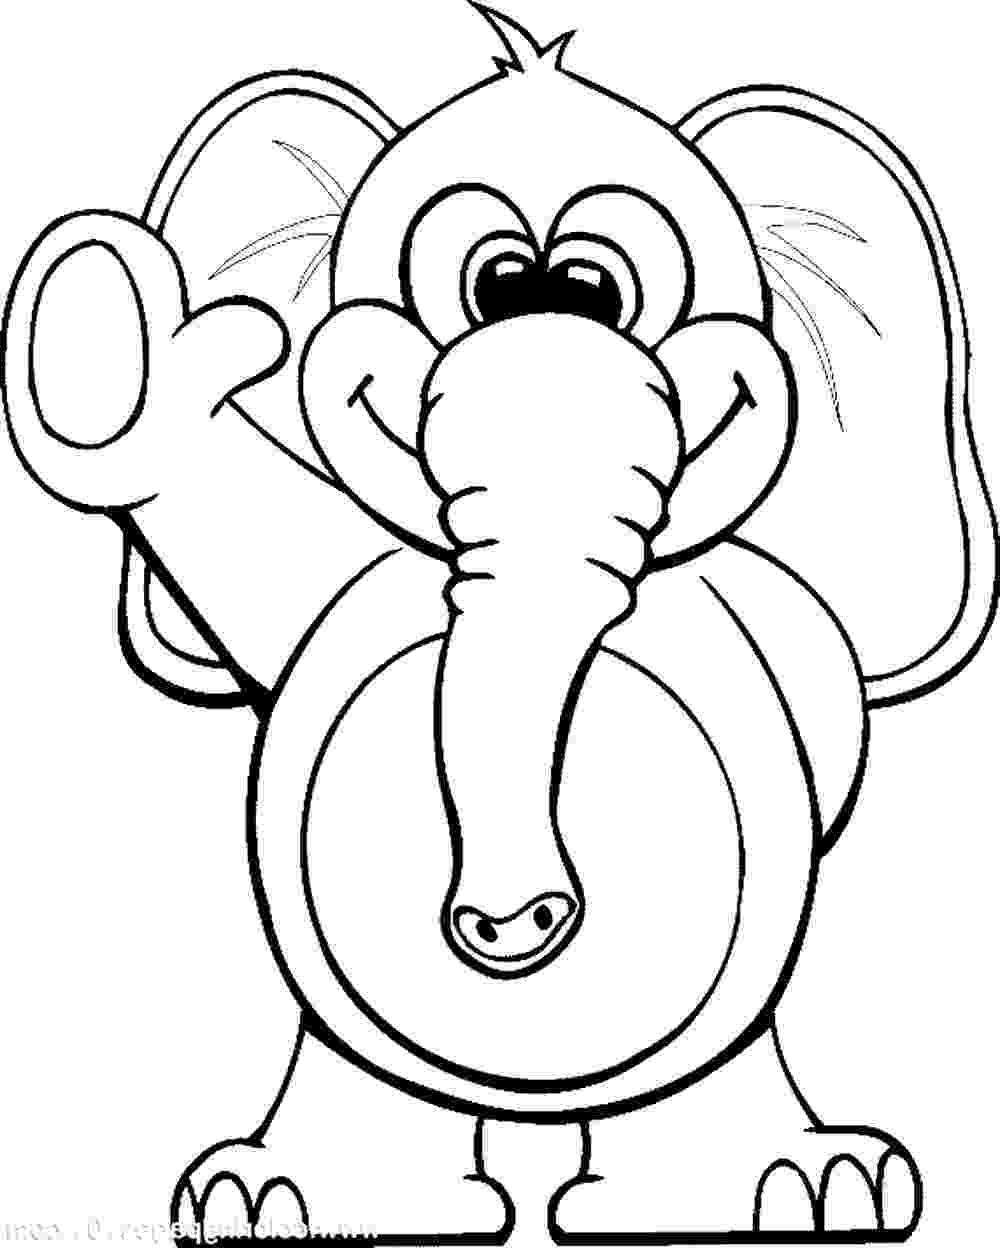 elephant coloring sheet print download teaching kids through elephant coloring coloring sheet elephant